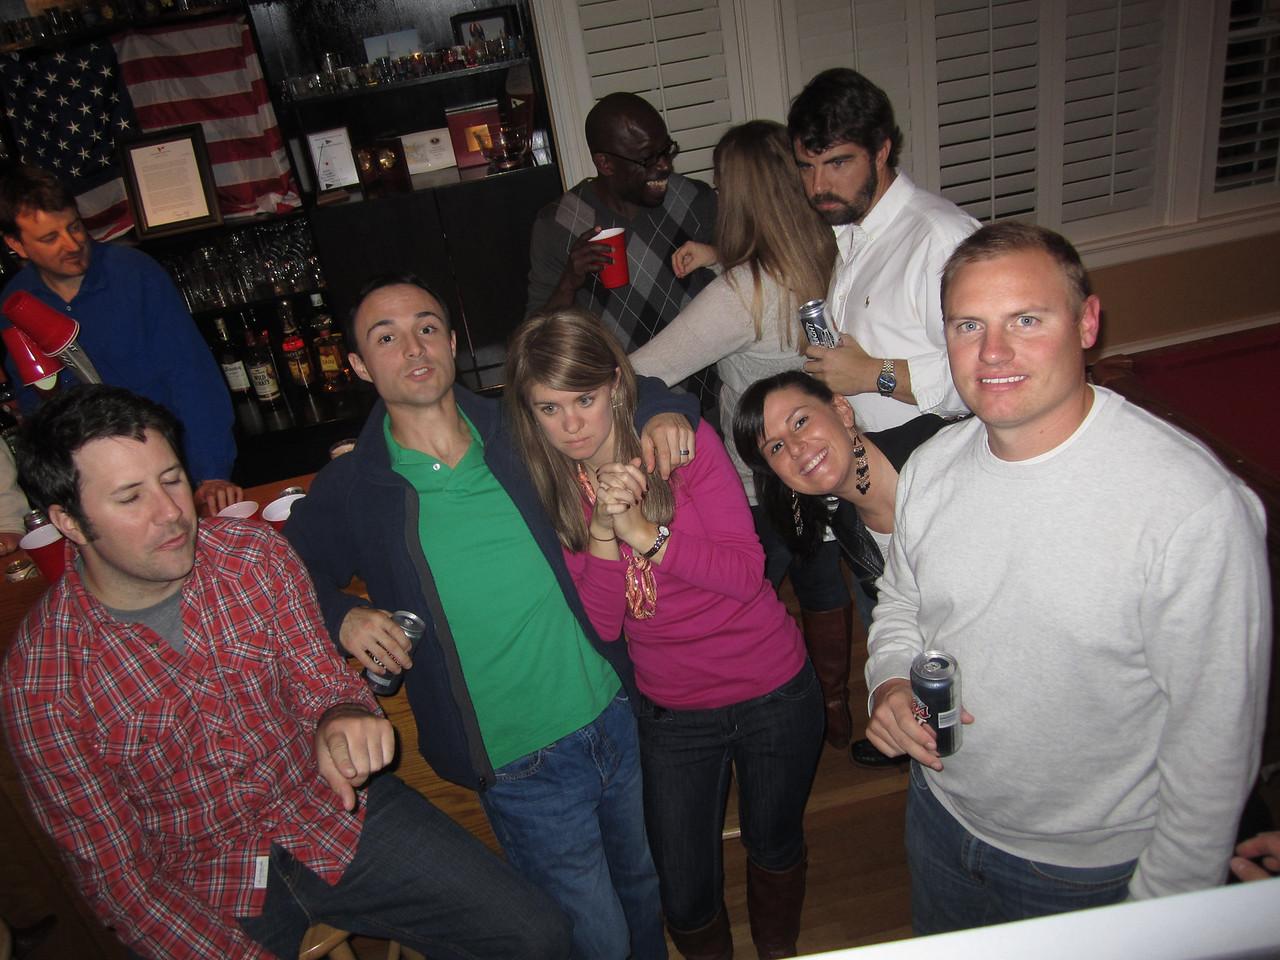 Preston, Chris, Jen, Sarah, JG